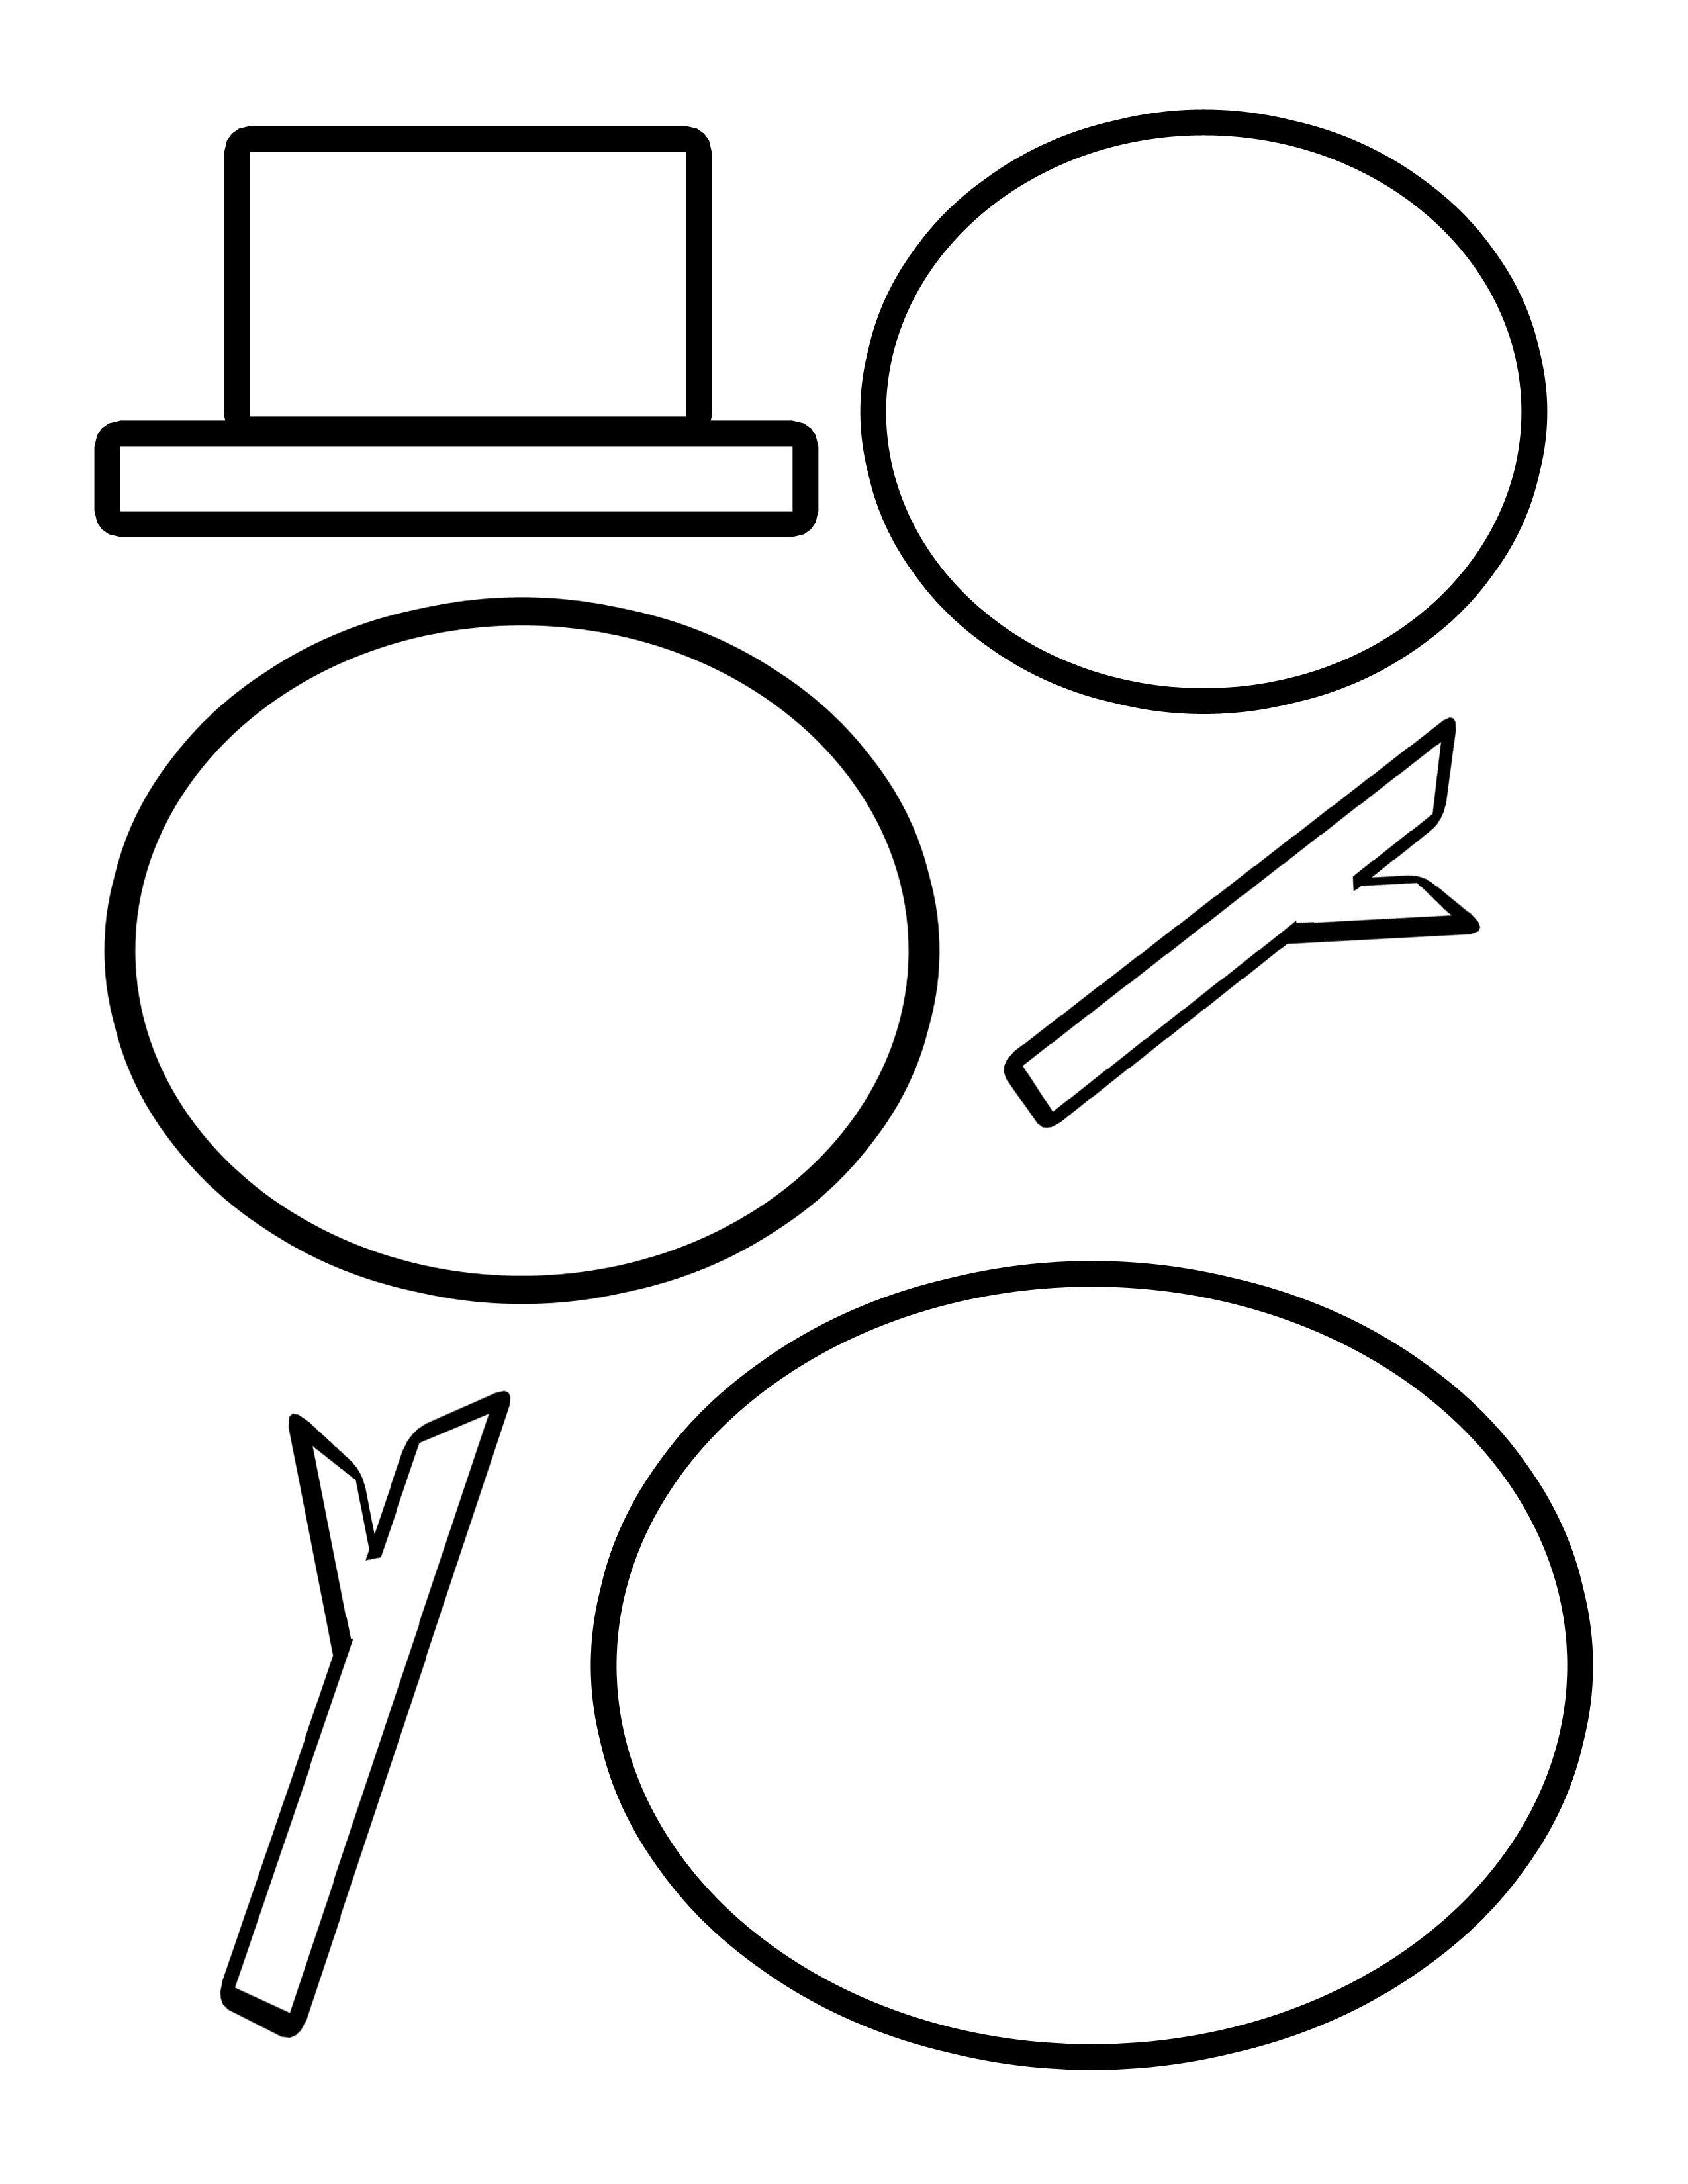 Cutting Templates - Free Printable Snowman Patterns